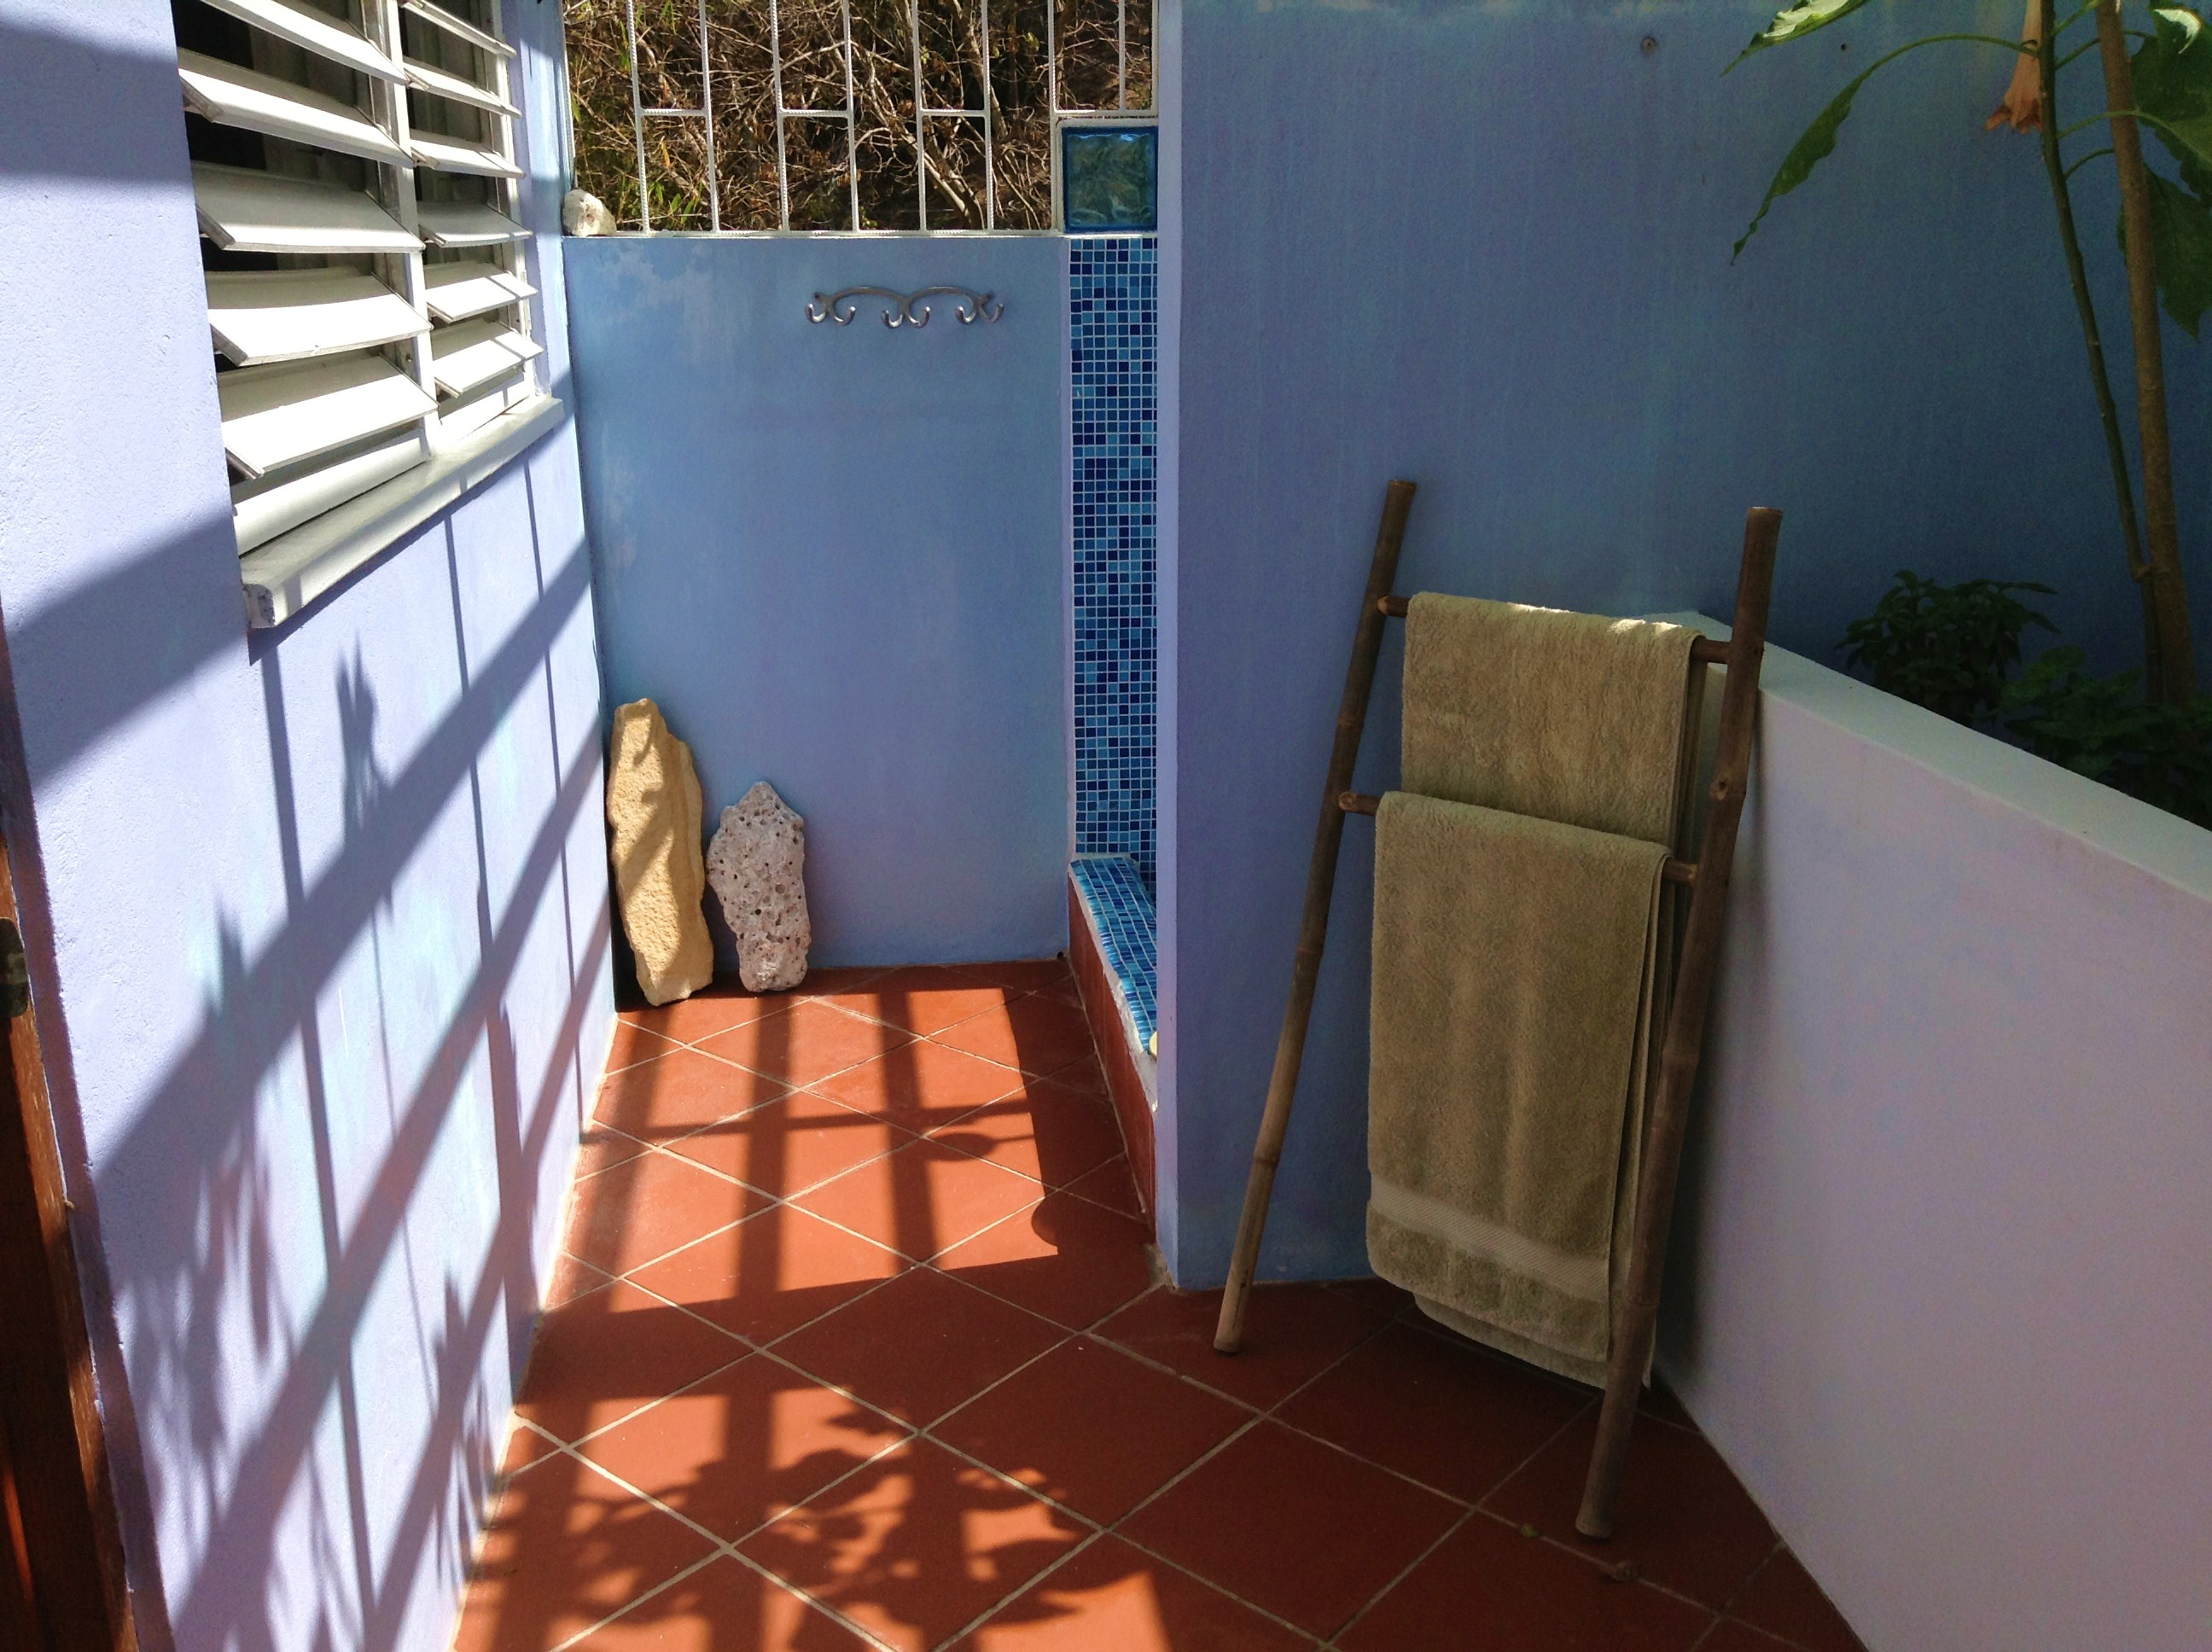 outdoor shower room entrance